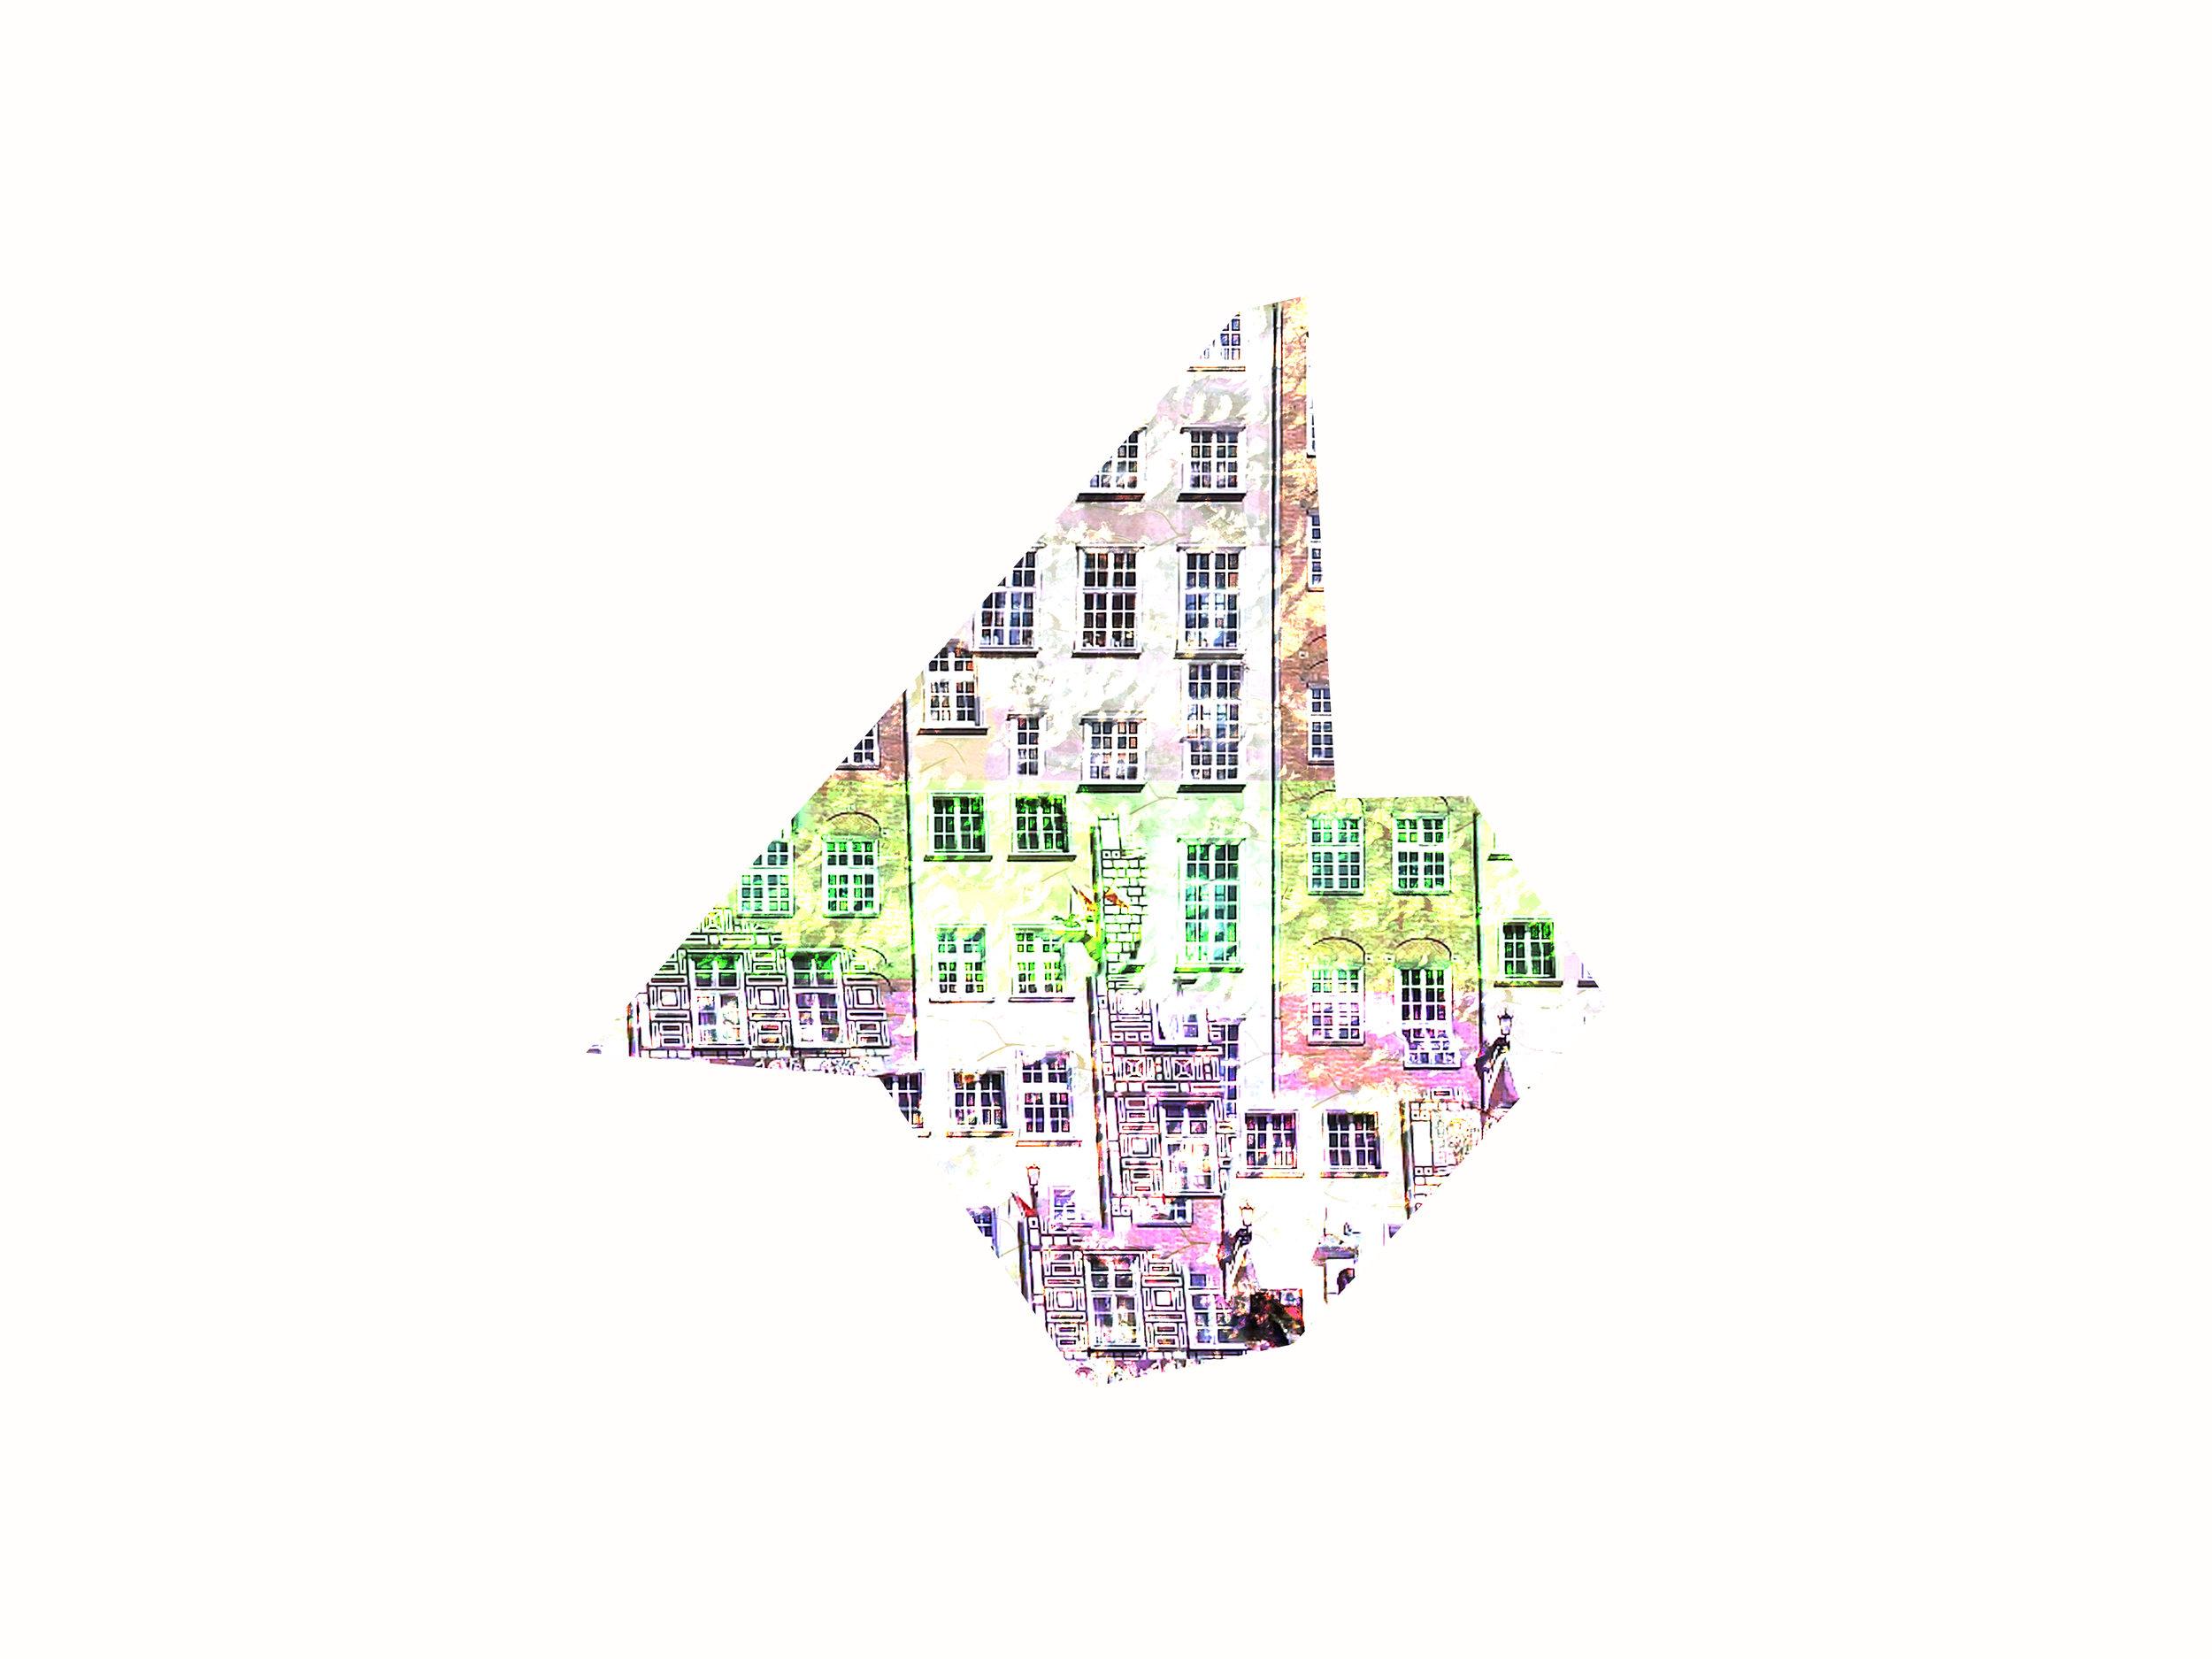 city_form_glitch_004.jpg